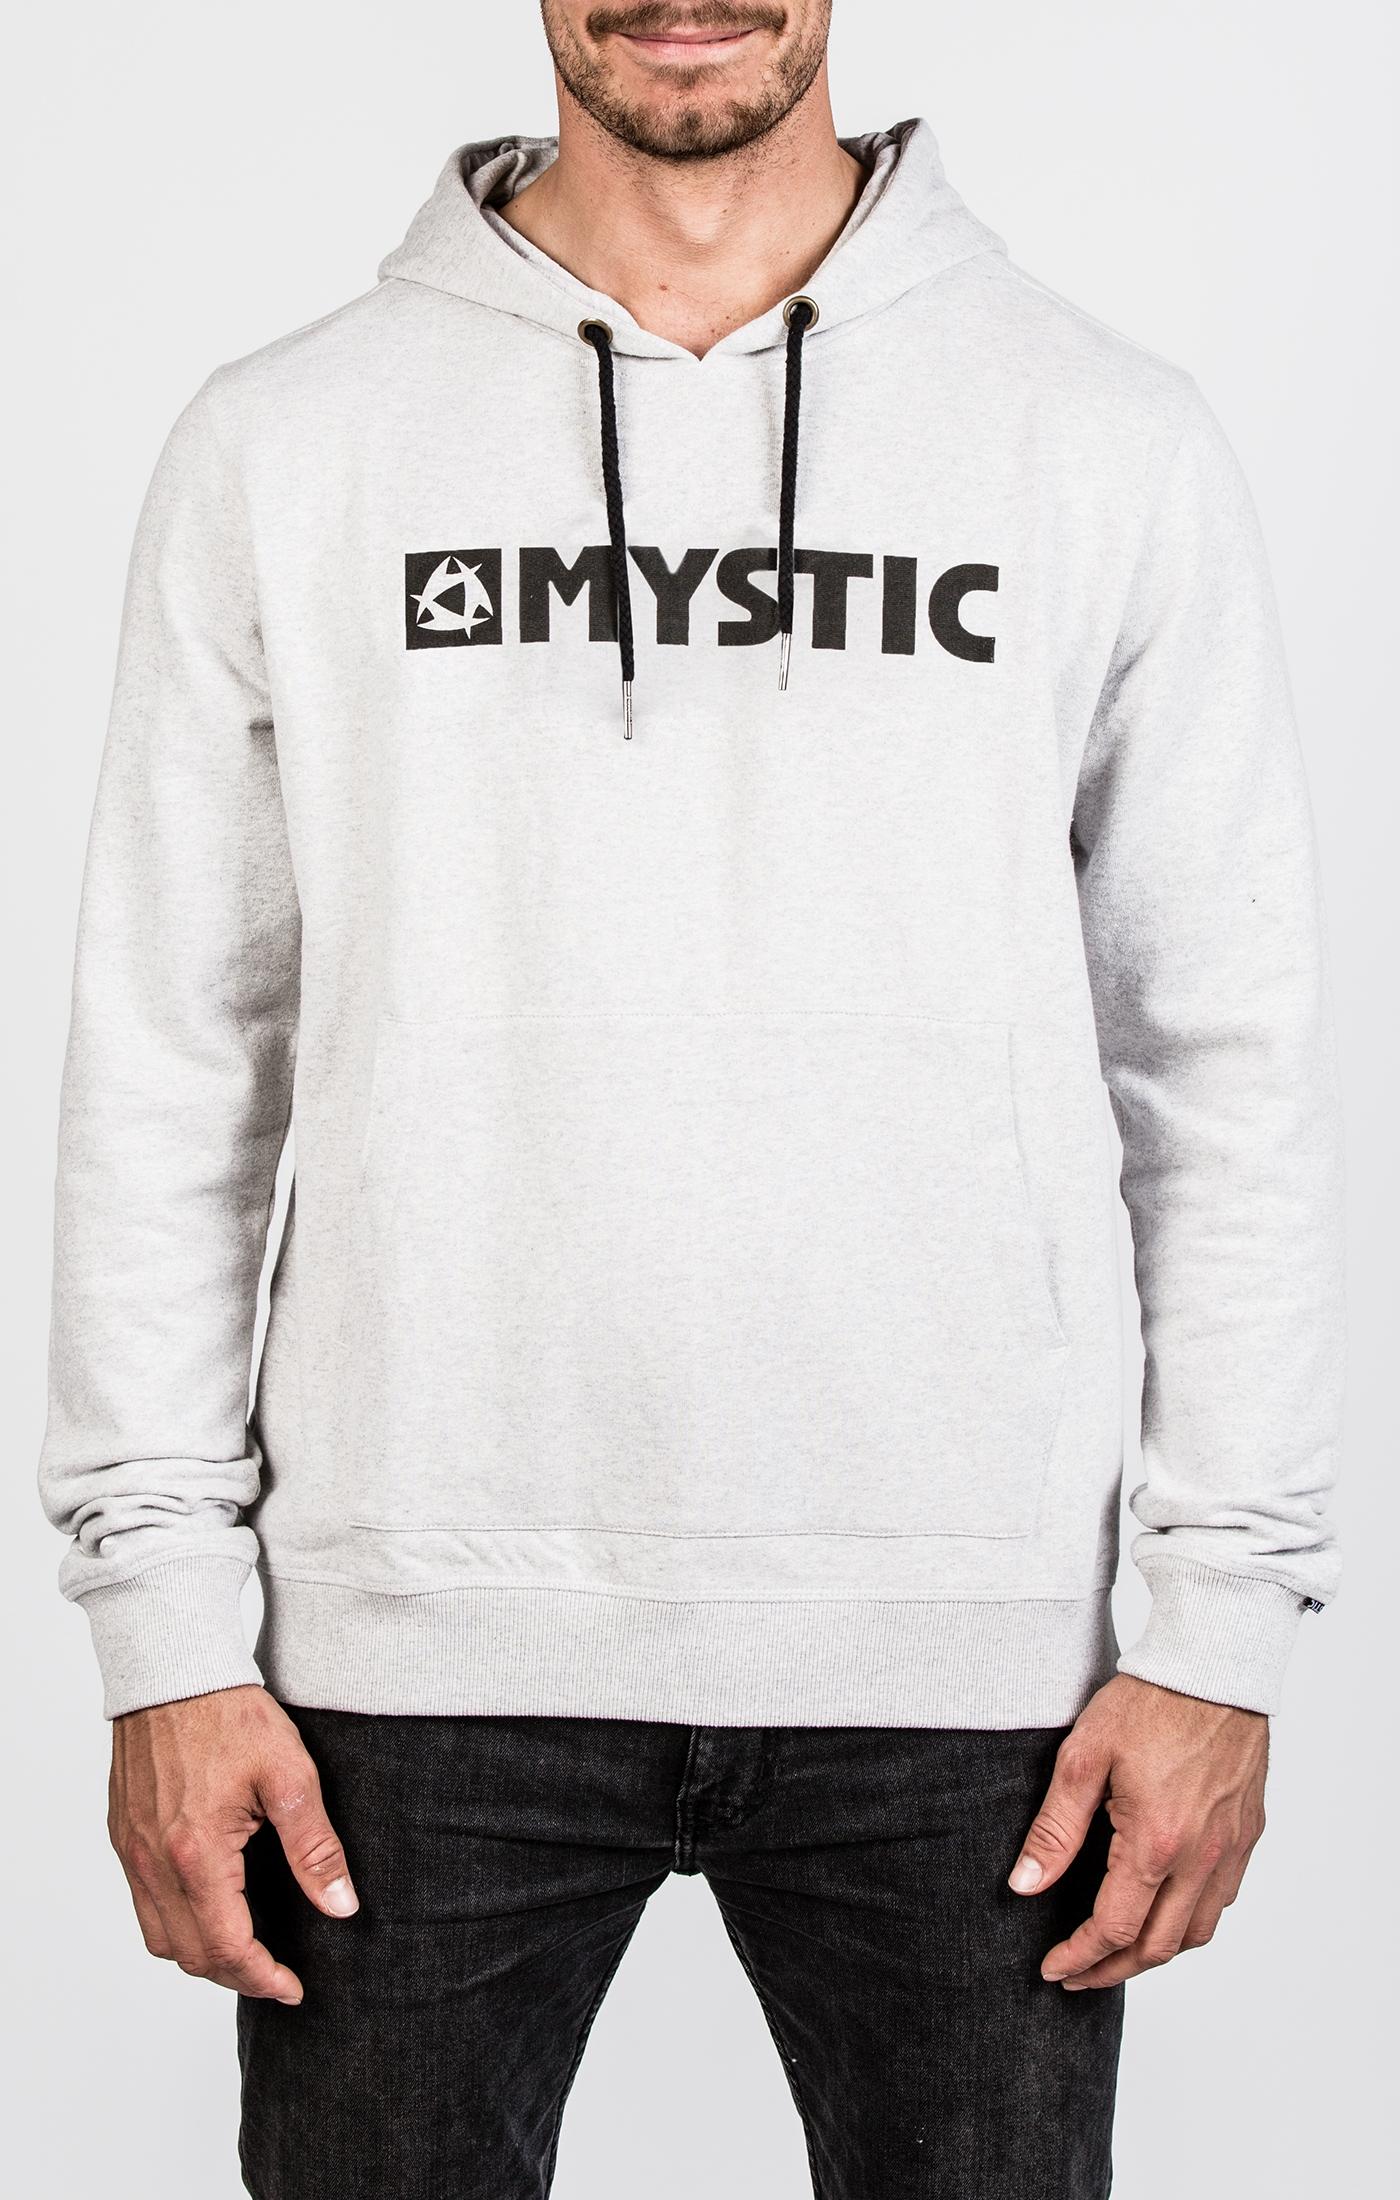 2018 Mystic Brand 3.0 Sweat Grey Melee laste pusa